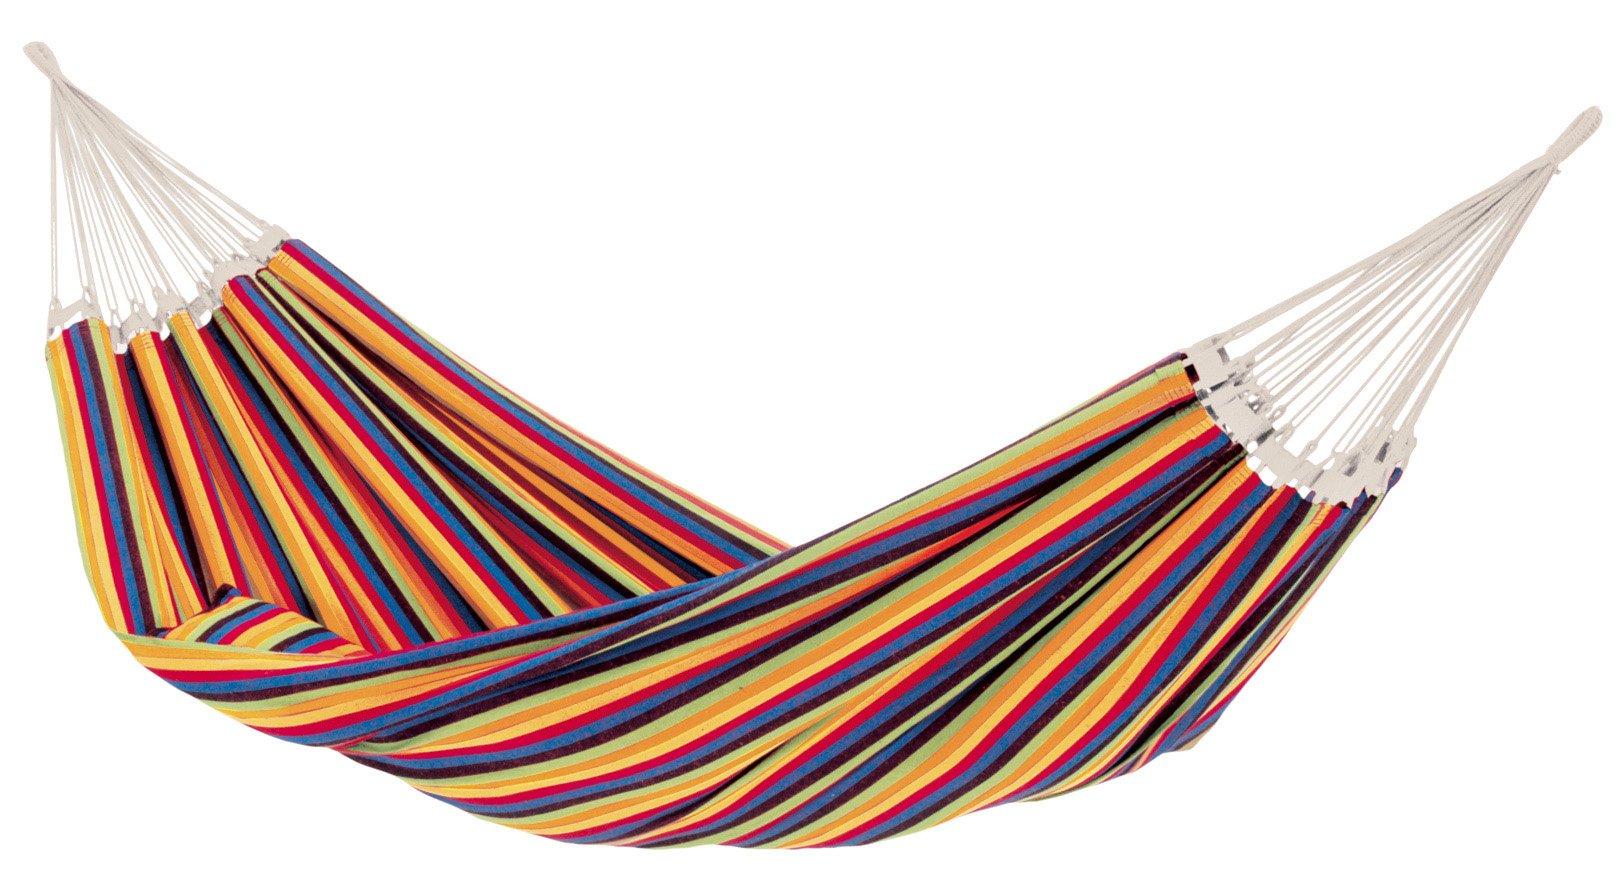 210 x 150 Hängematte 2-Personen NEU Doppelhängematte Regenbogen extra breit ca